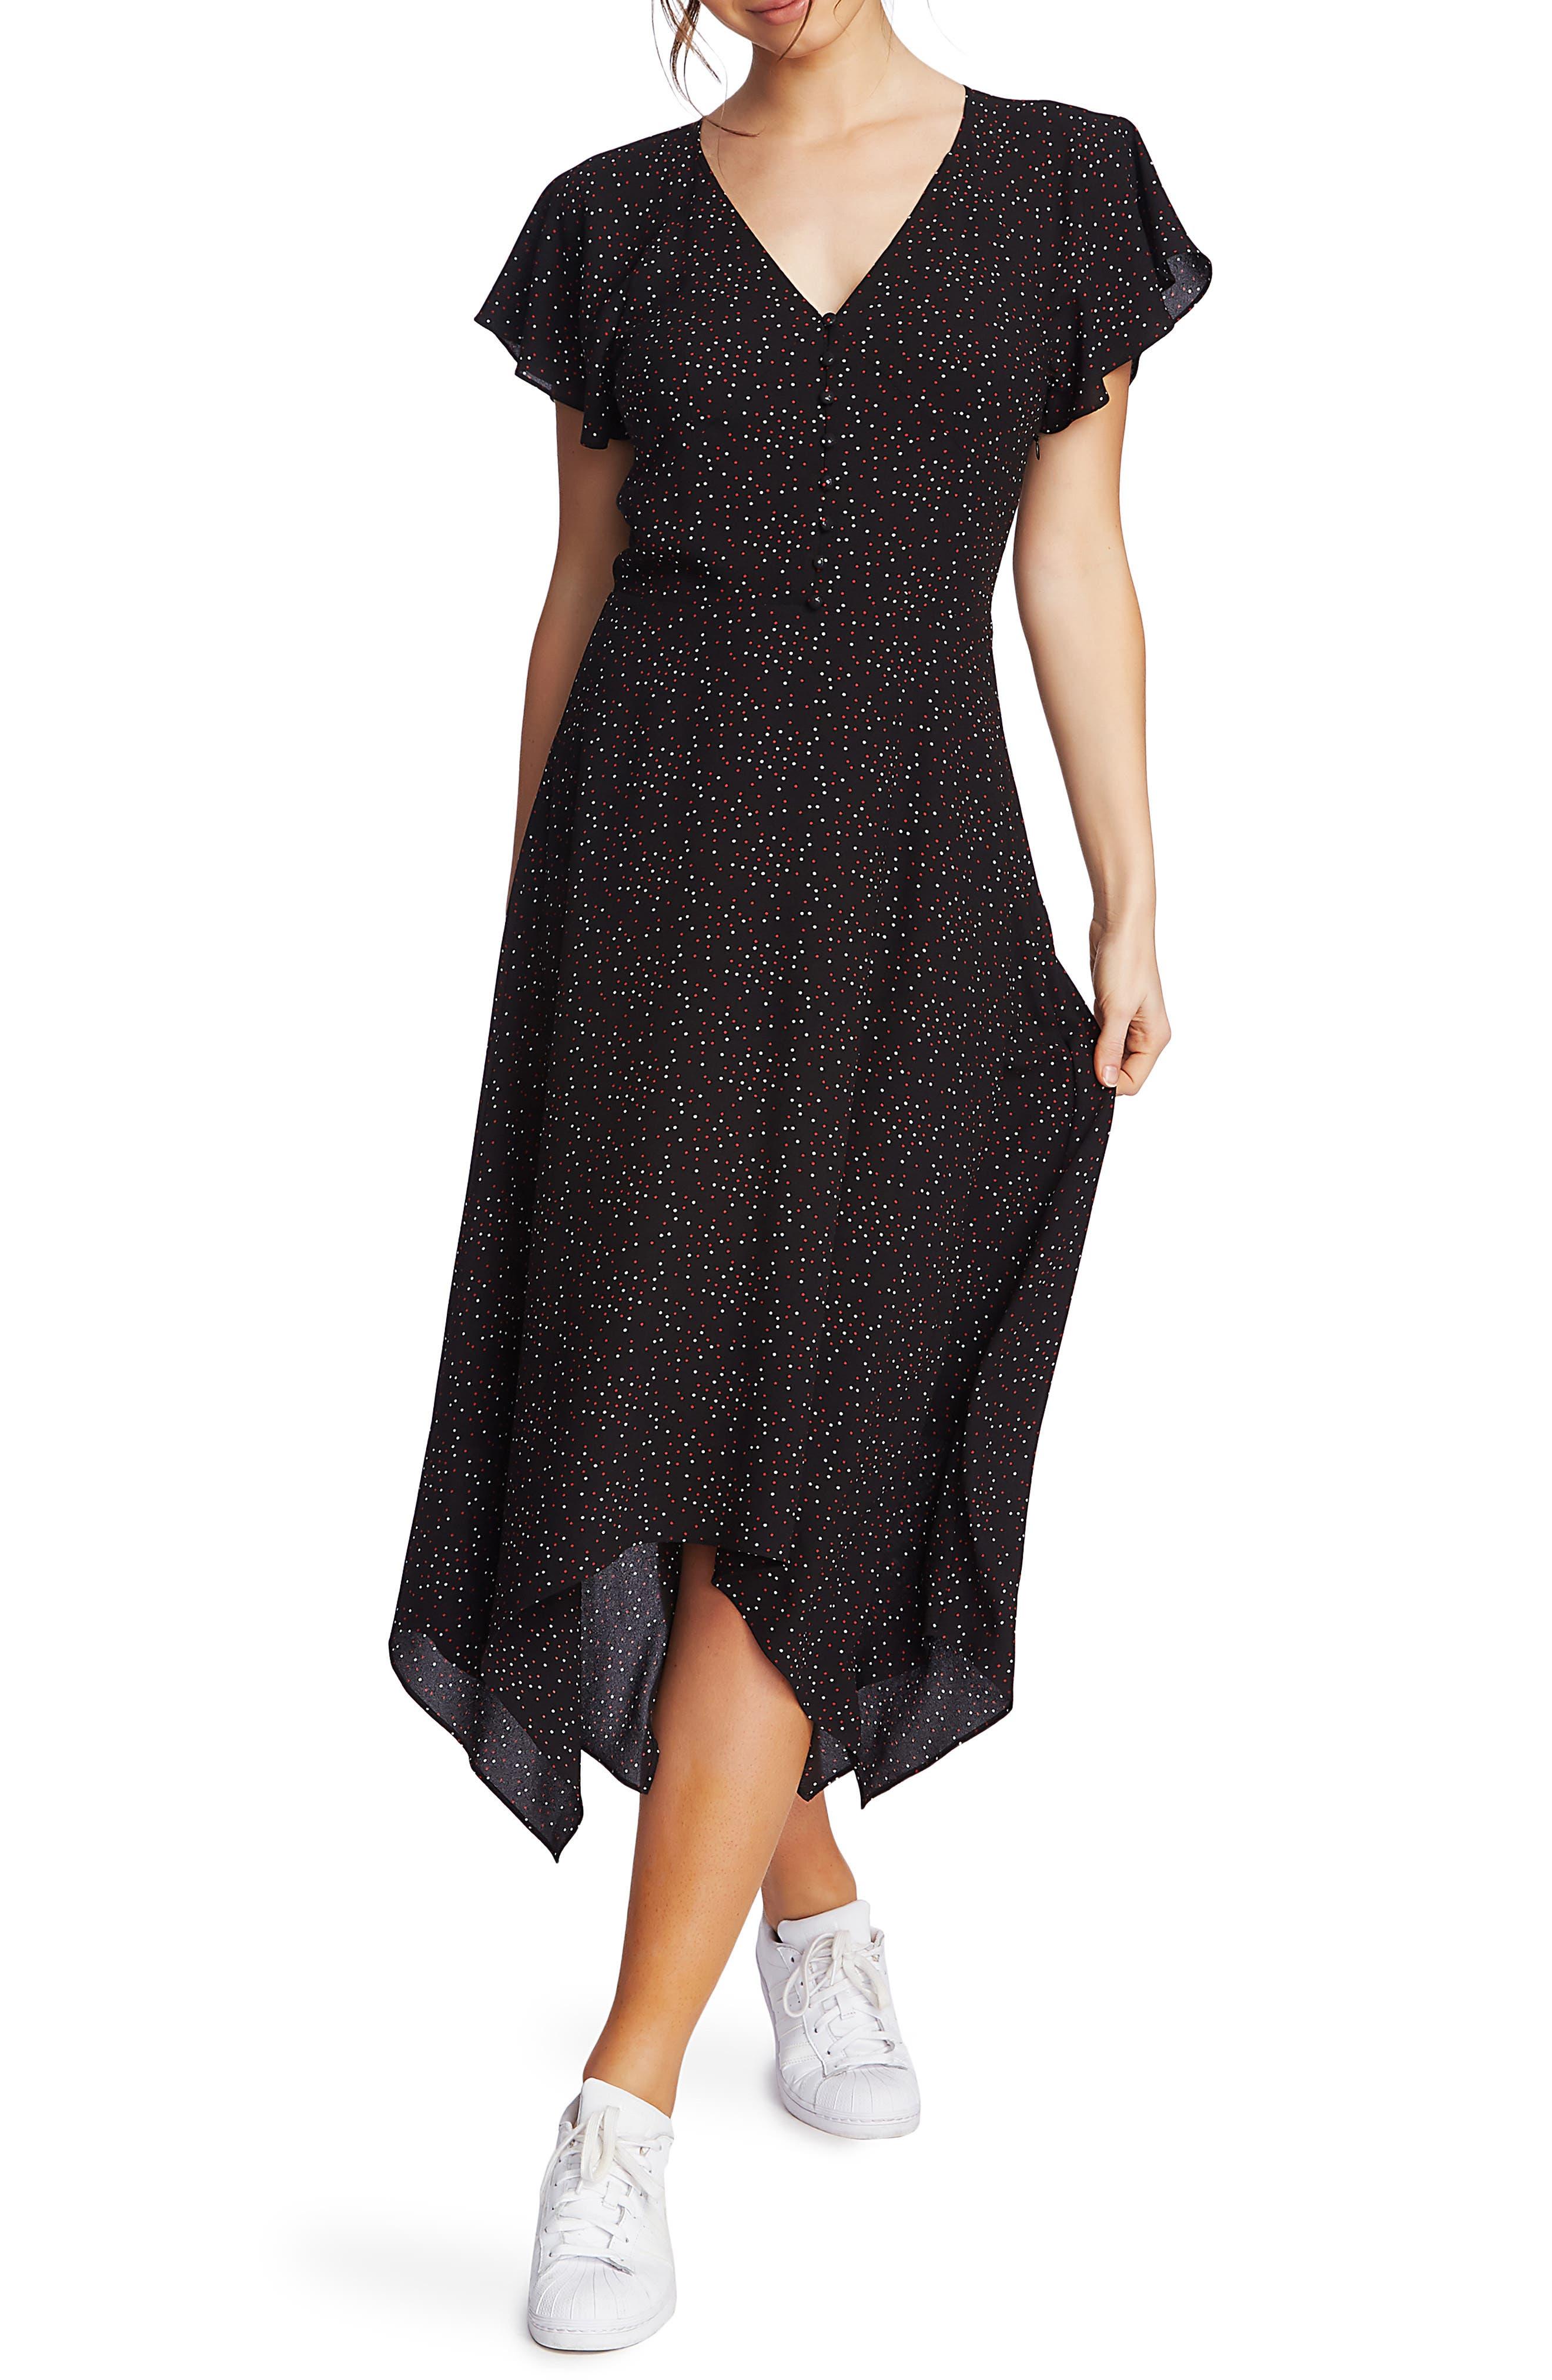 Polka Dot Dresses: 20s, 30s, 40s, 50s, 60s Womens 1.state Dot Print Midi Dress $129.00 AT vintagedancer.com